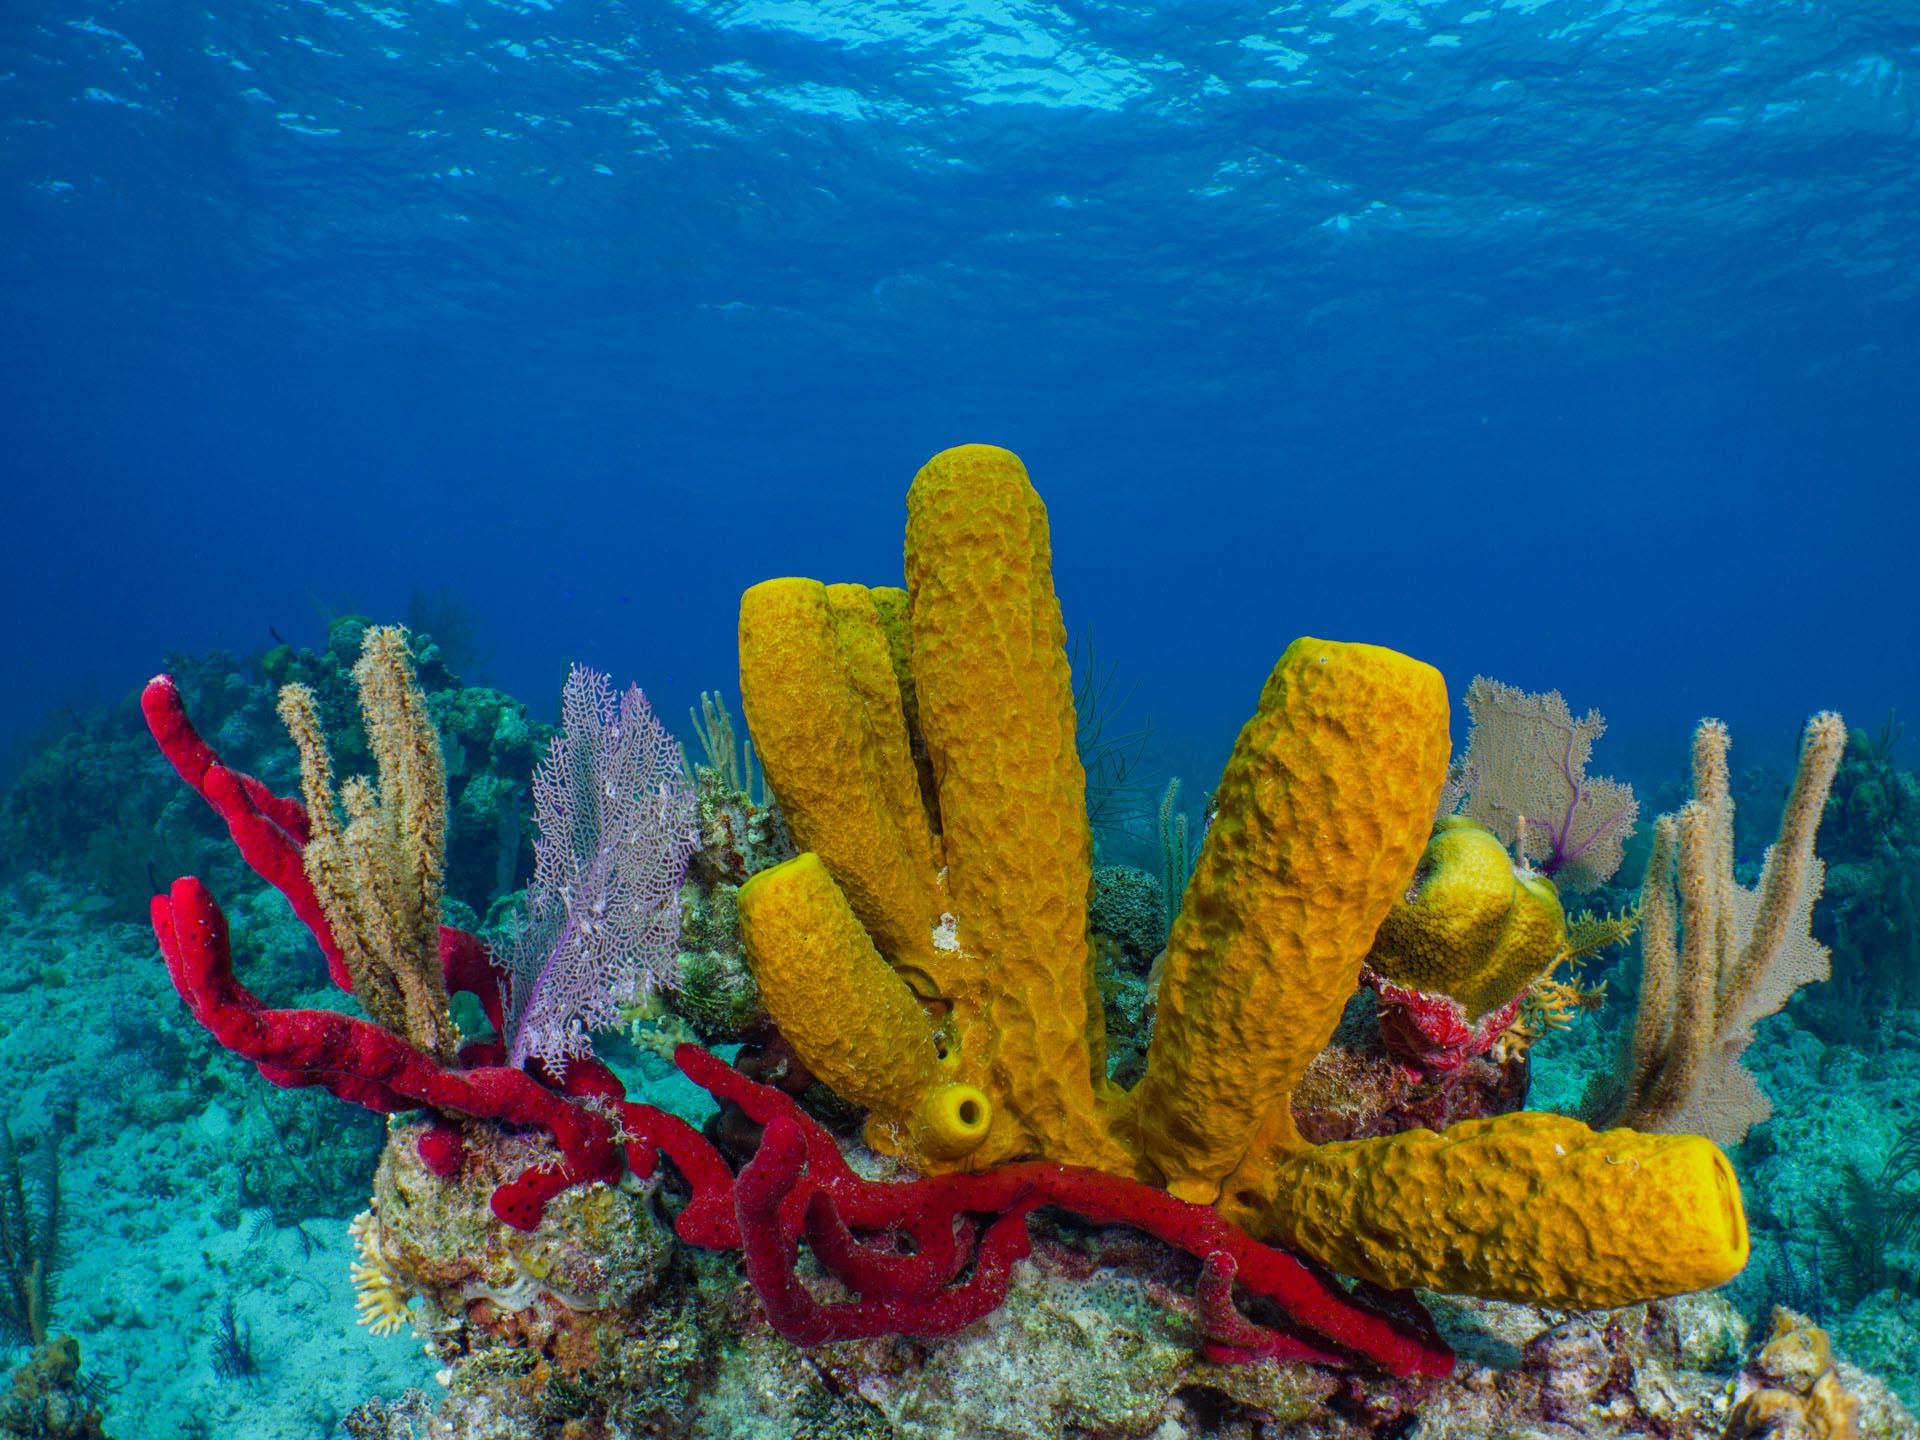 Yellow sea sponge un Caribbean